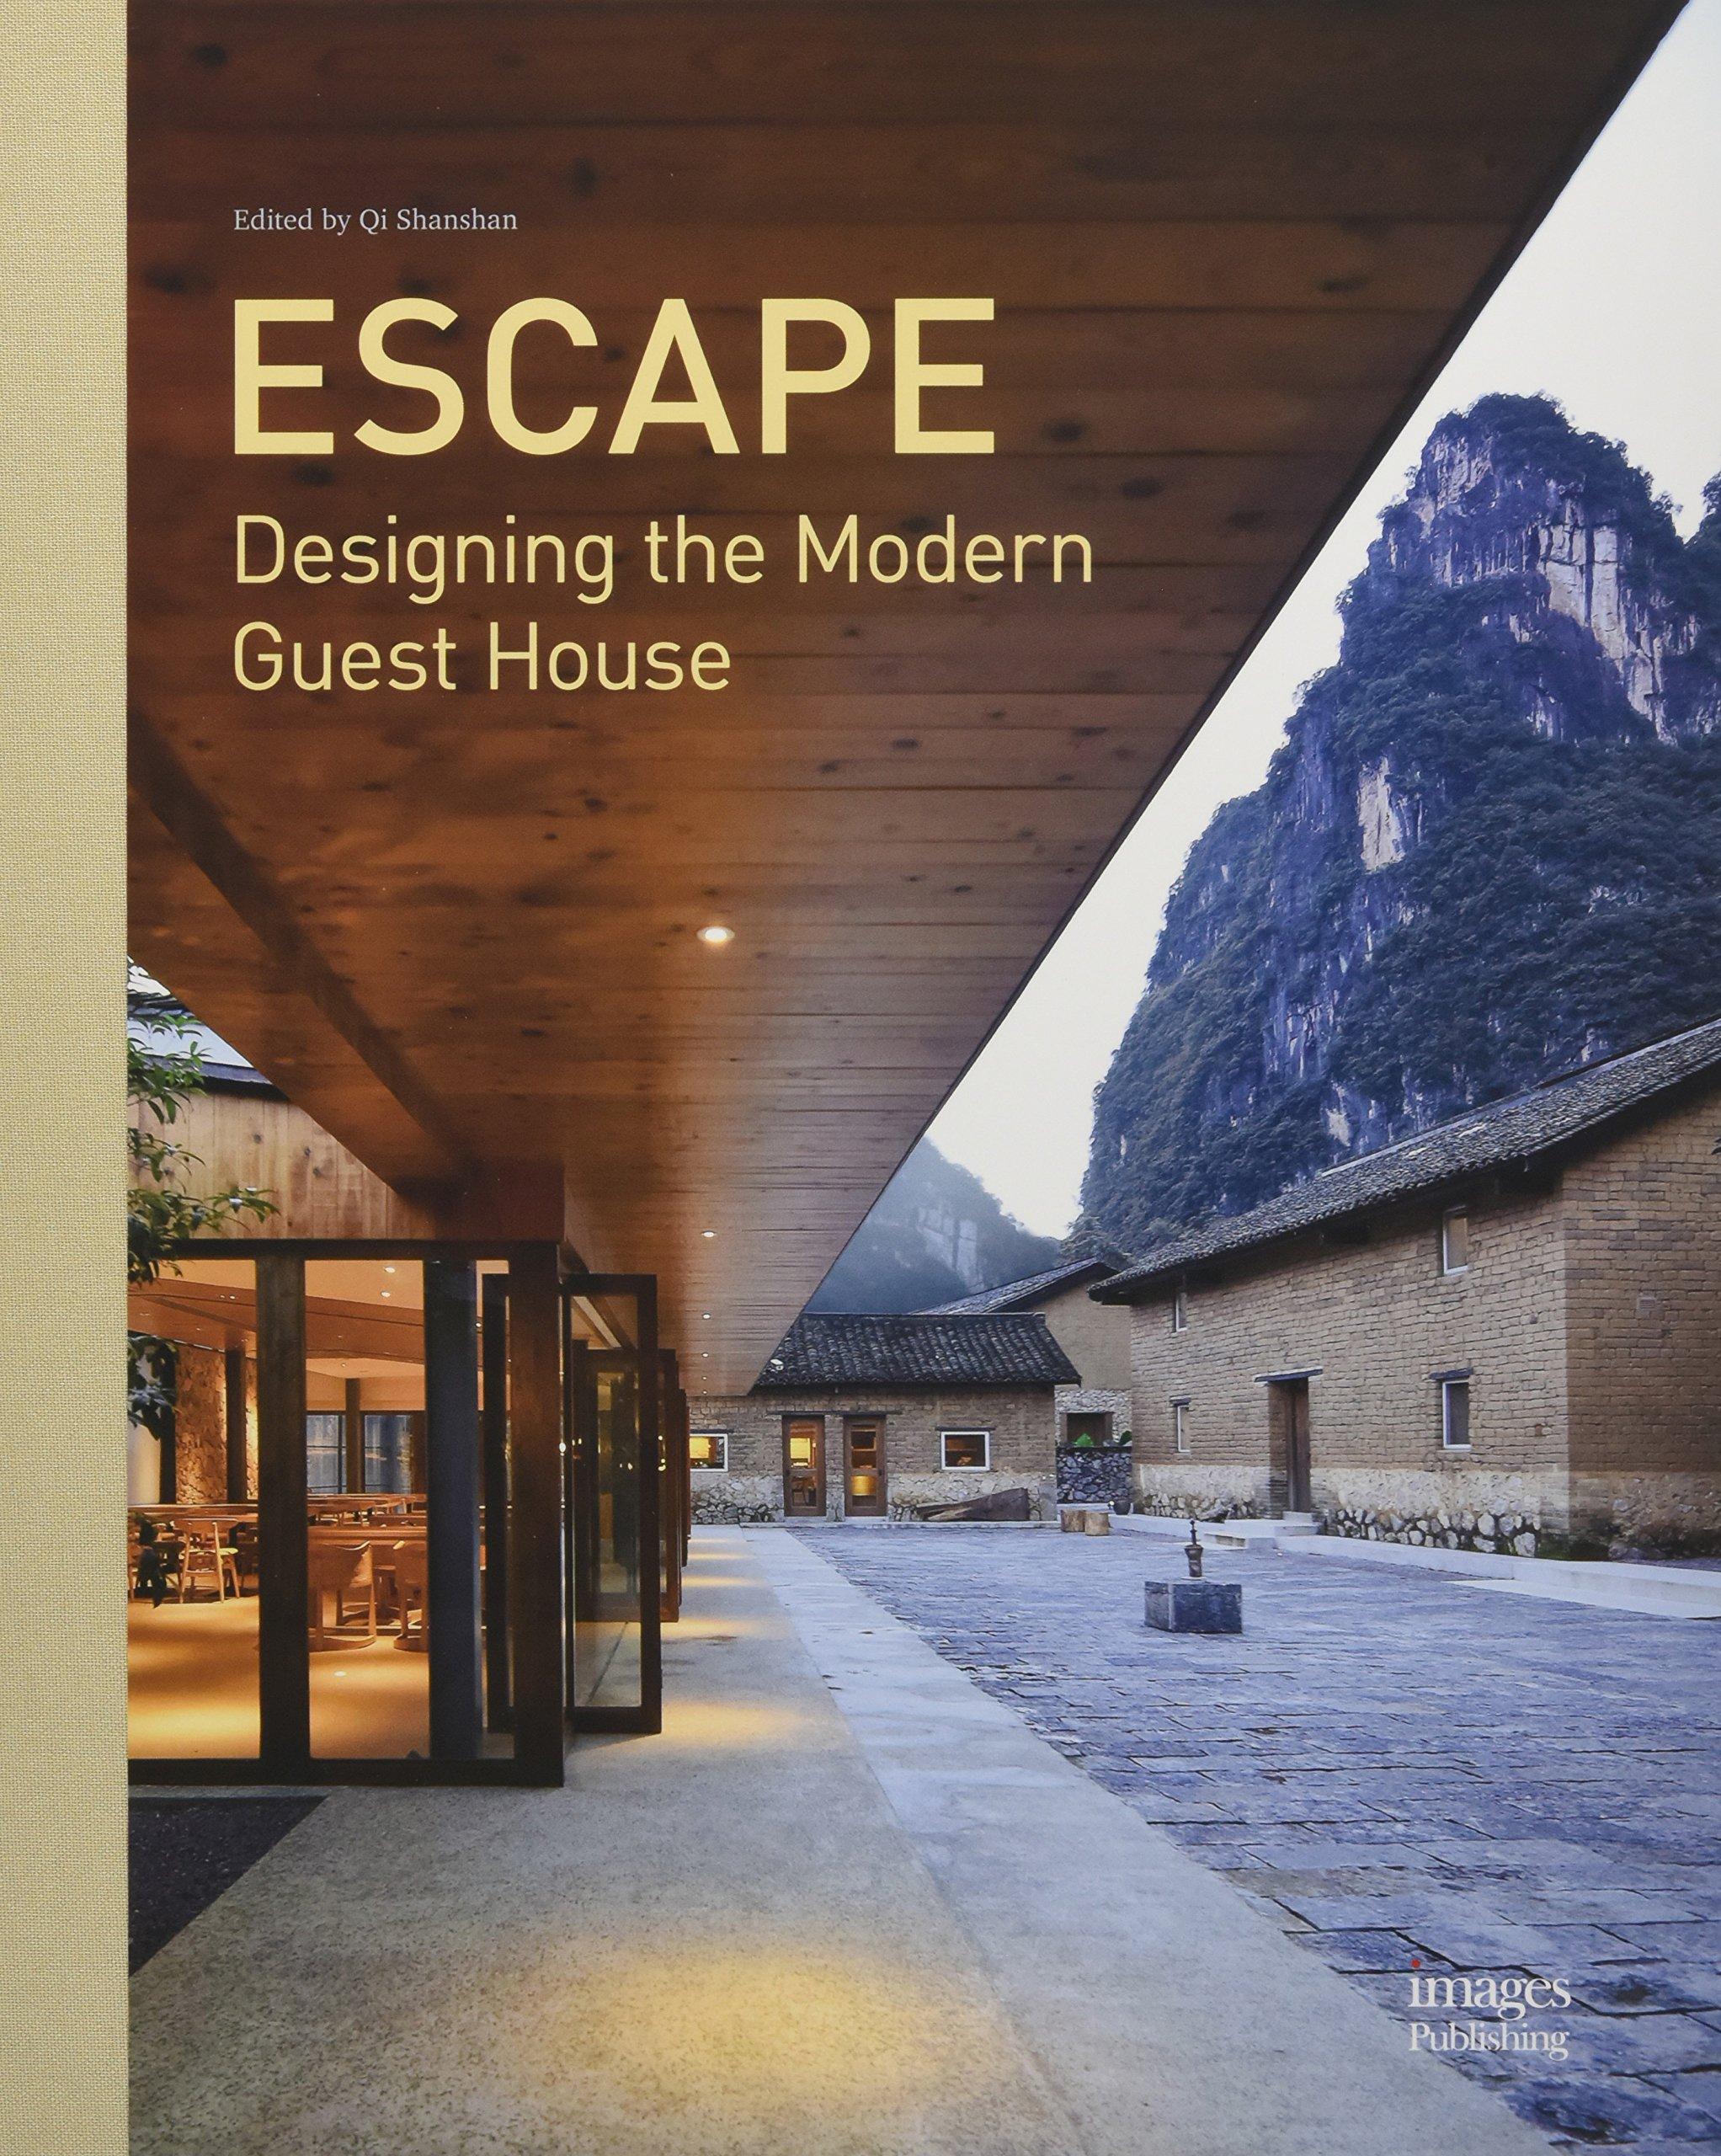 modern guest house. Escape: Designing The Modern Guest House: Shanshan Qi: 9781864707045: Amazon.com: Books House